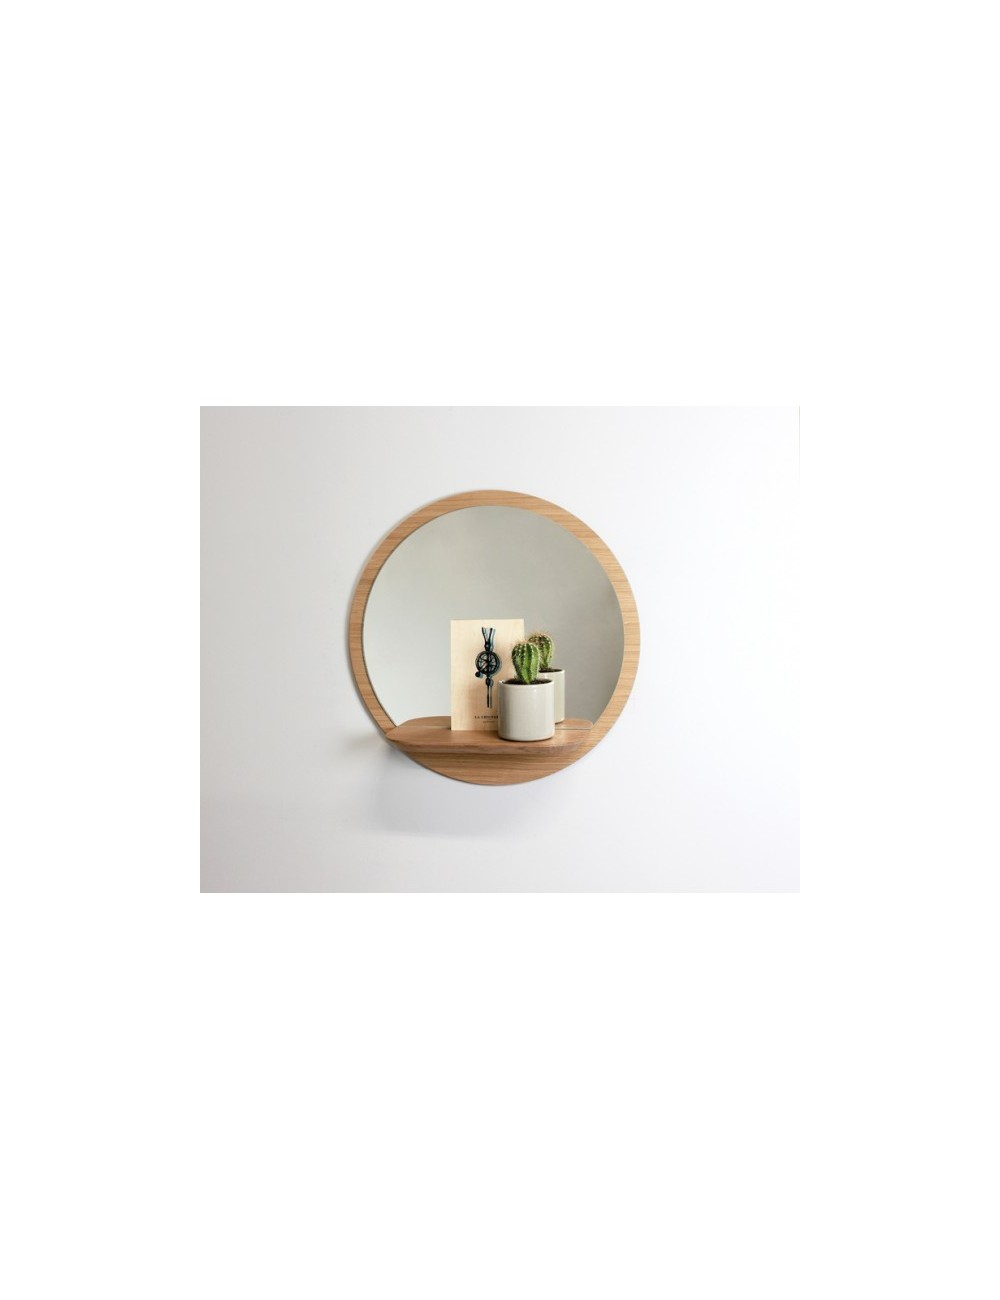 Sunrise- le petit miroir avec tablette made in France reine mere